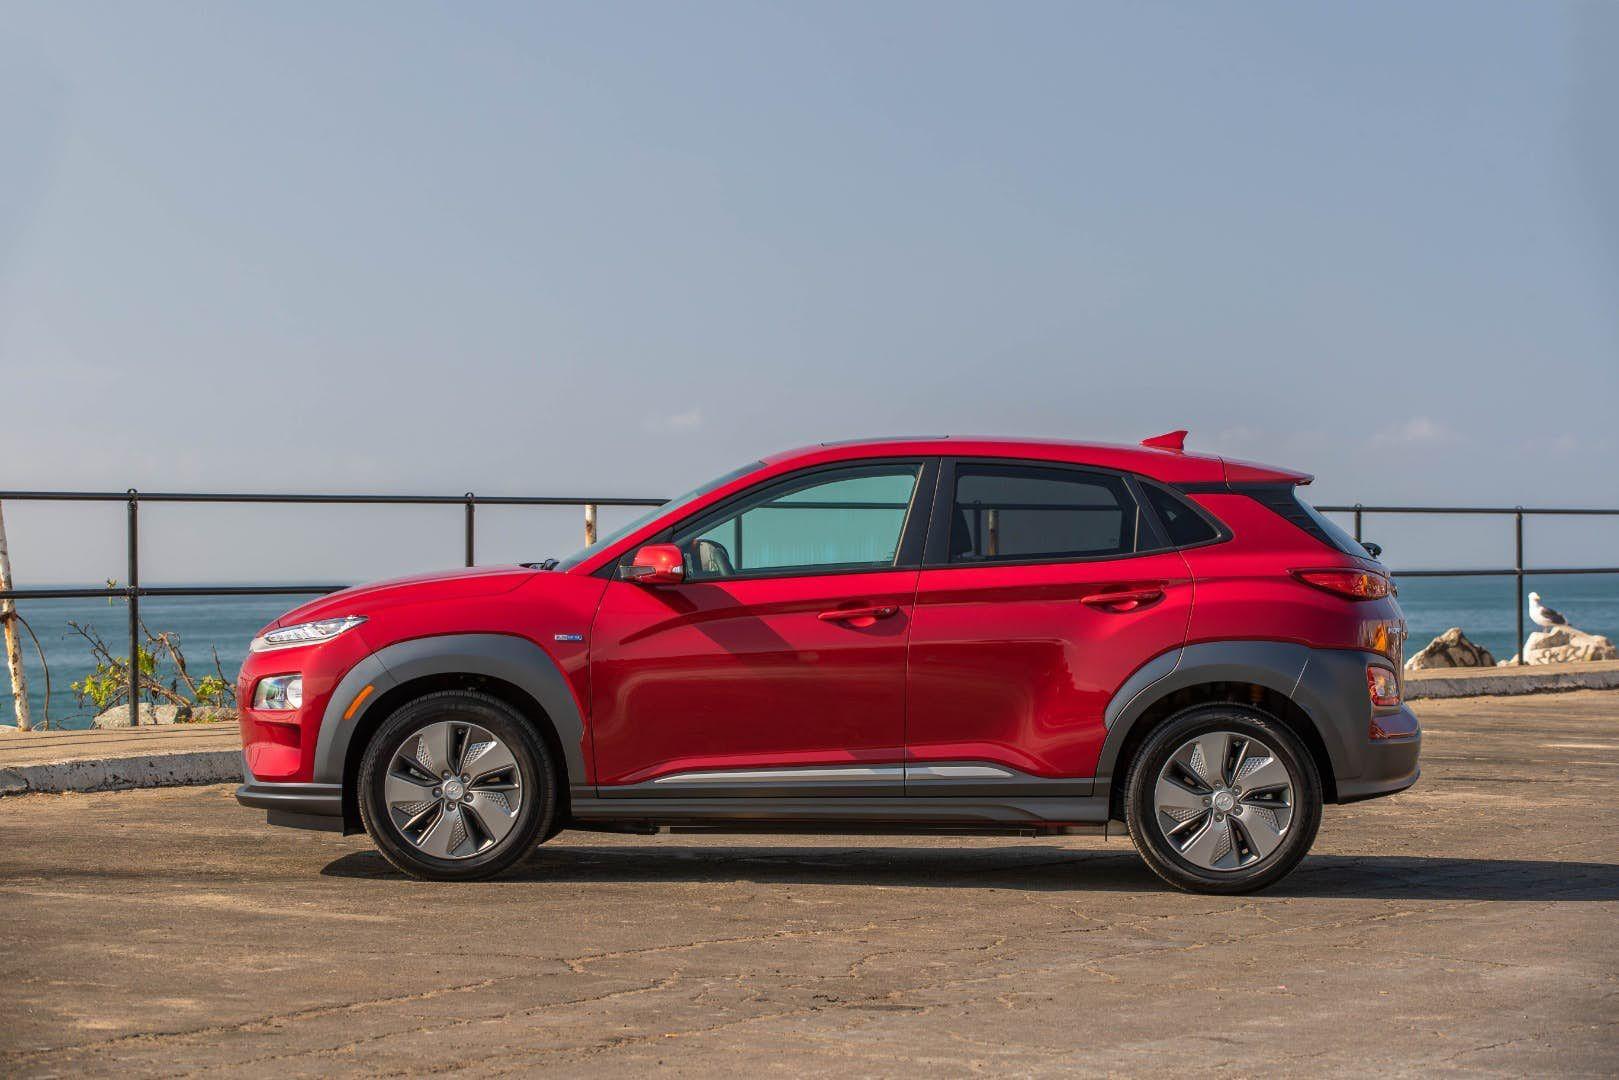 Hyundai prices its electrified Kona SUV for the mass